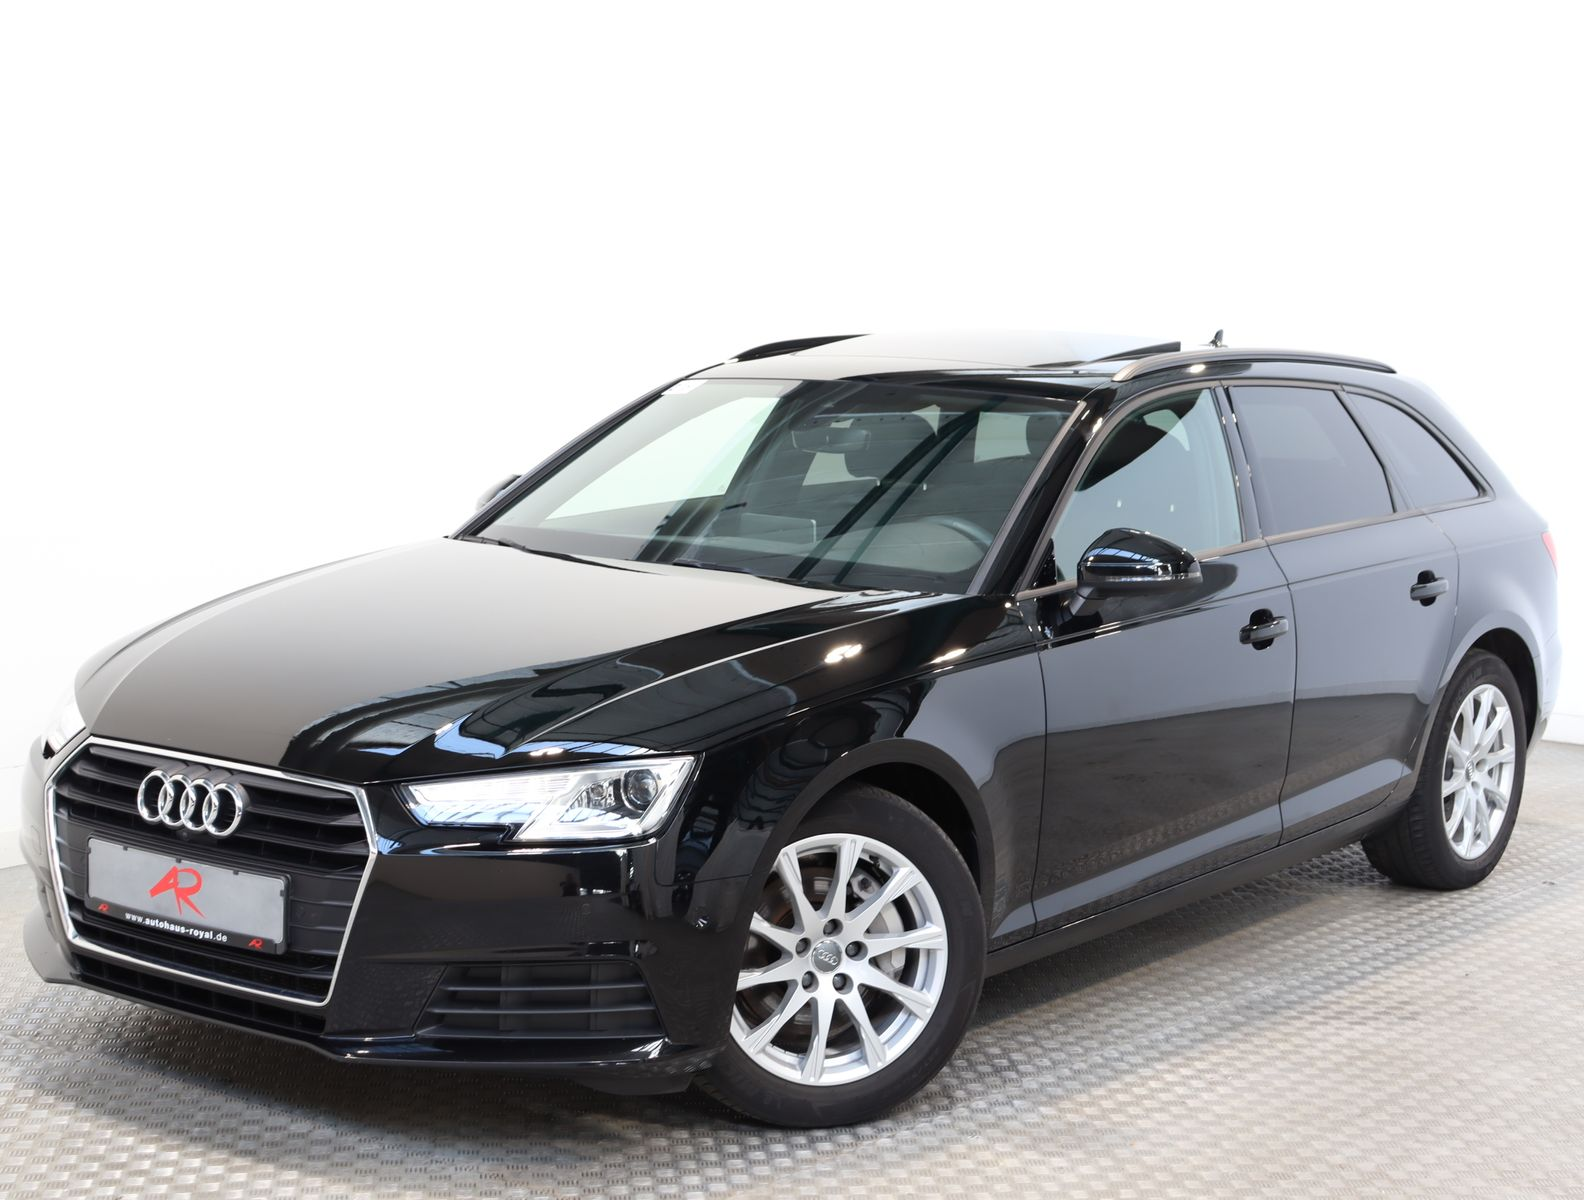 Audi A4 Avant 2.0 TDI VIRTUAL,360GRAD,PANO,STANDHEIZ., Jahr 2018, Diesel